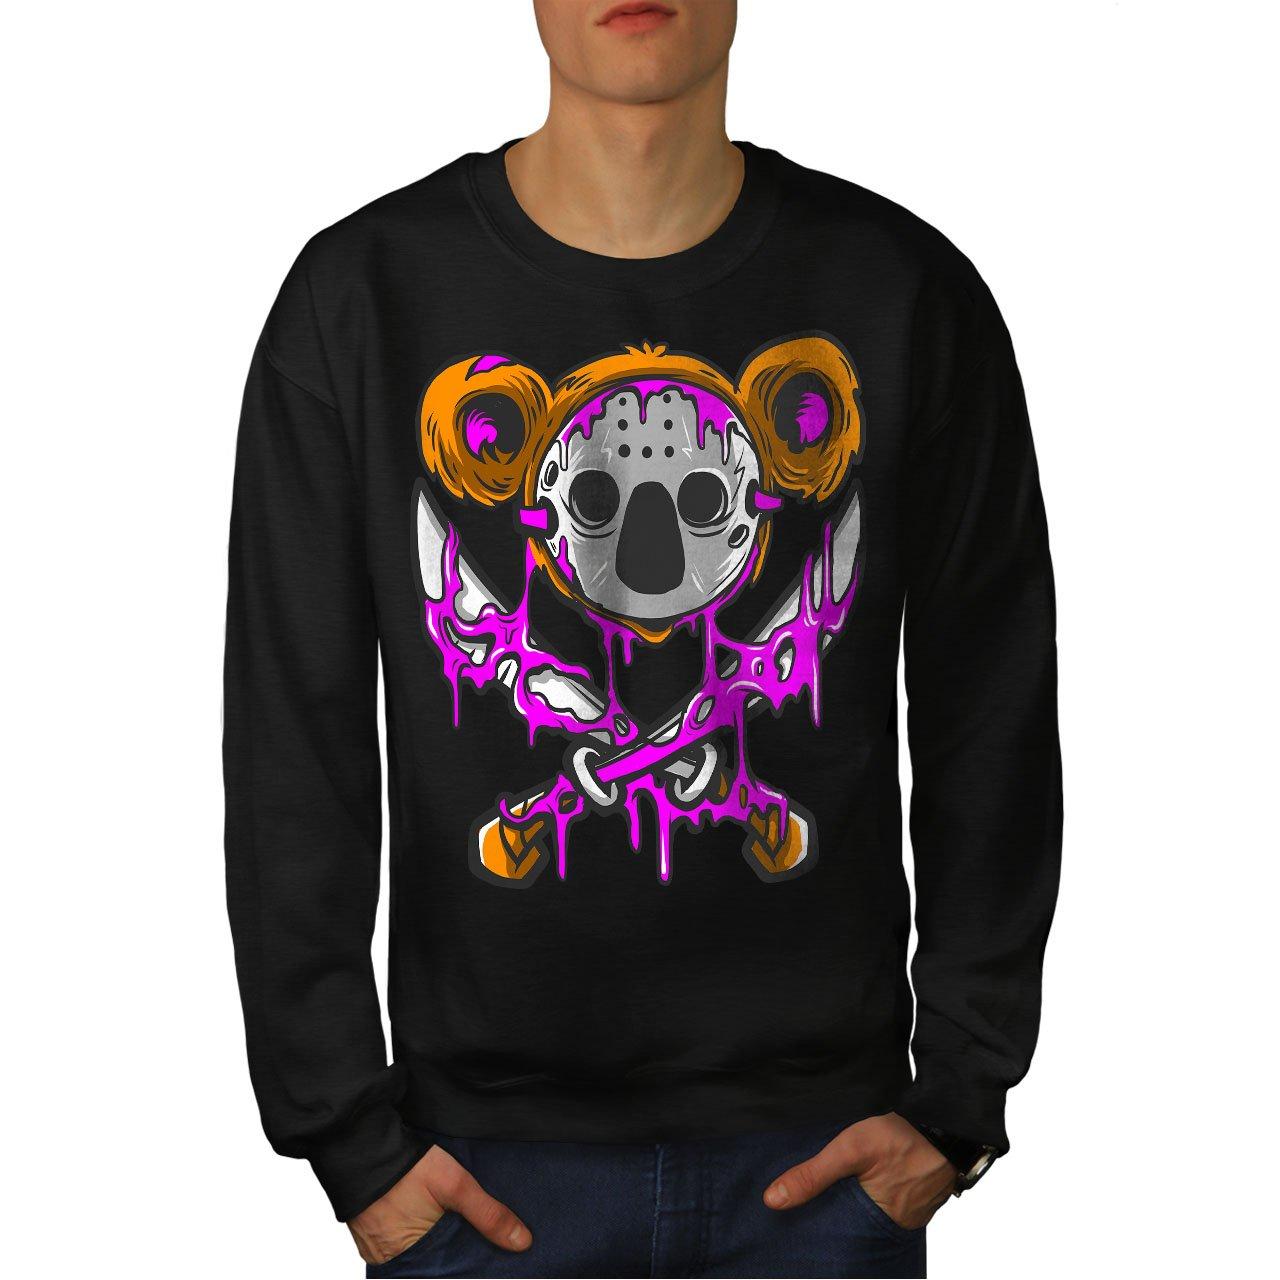 Cool Casual Jumper wellcoda Koala Murder Mens Sweatshirt